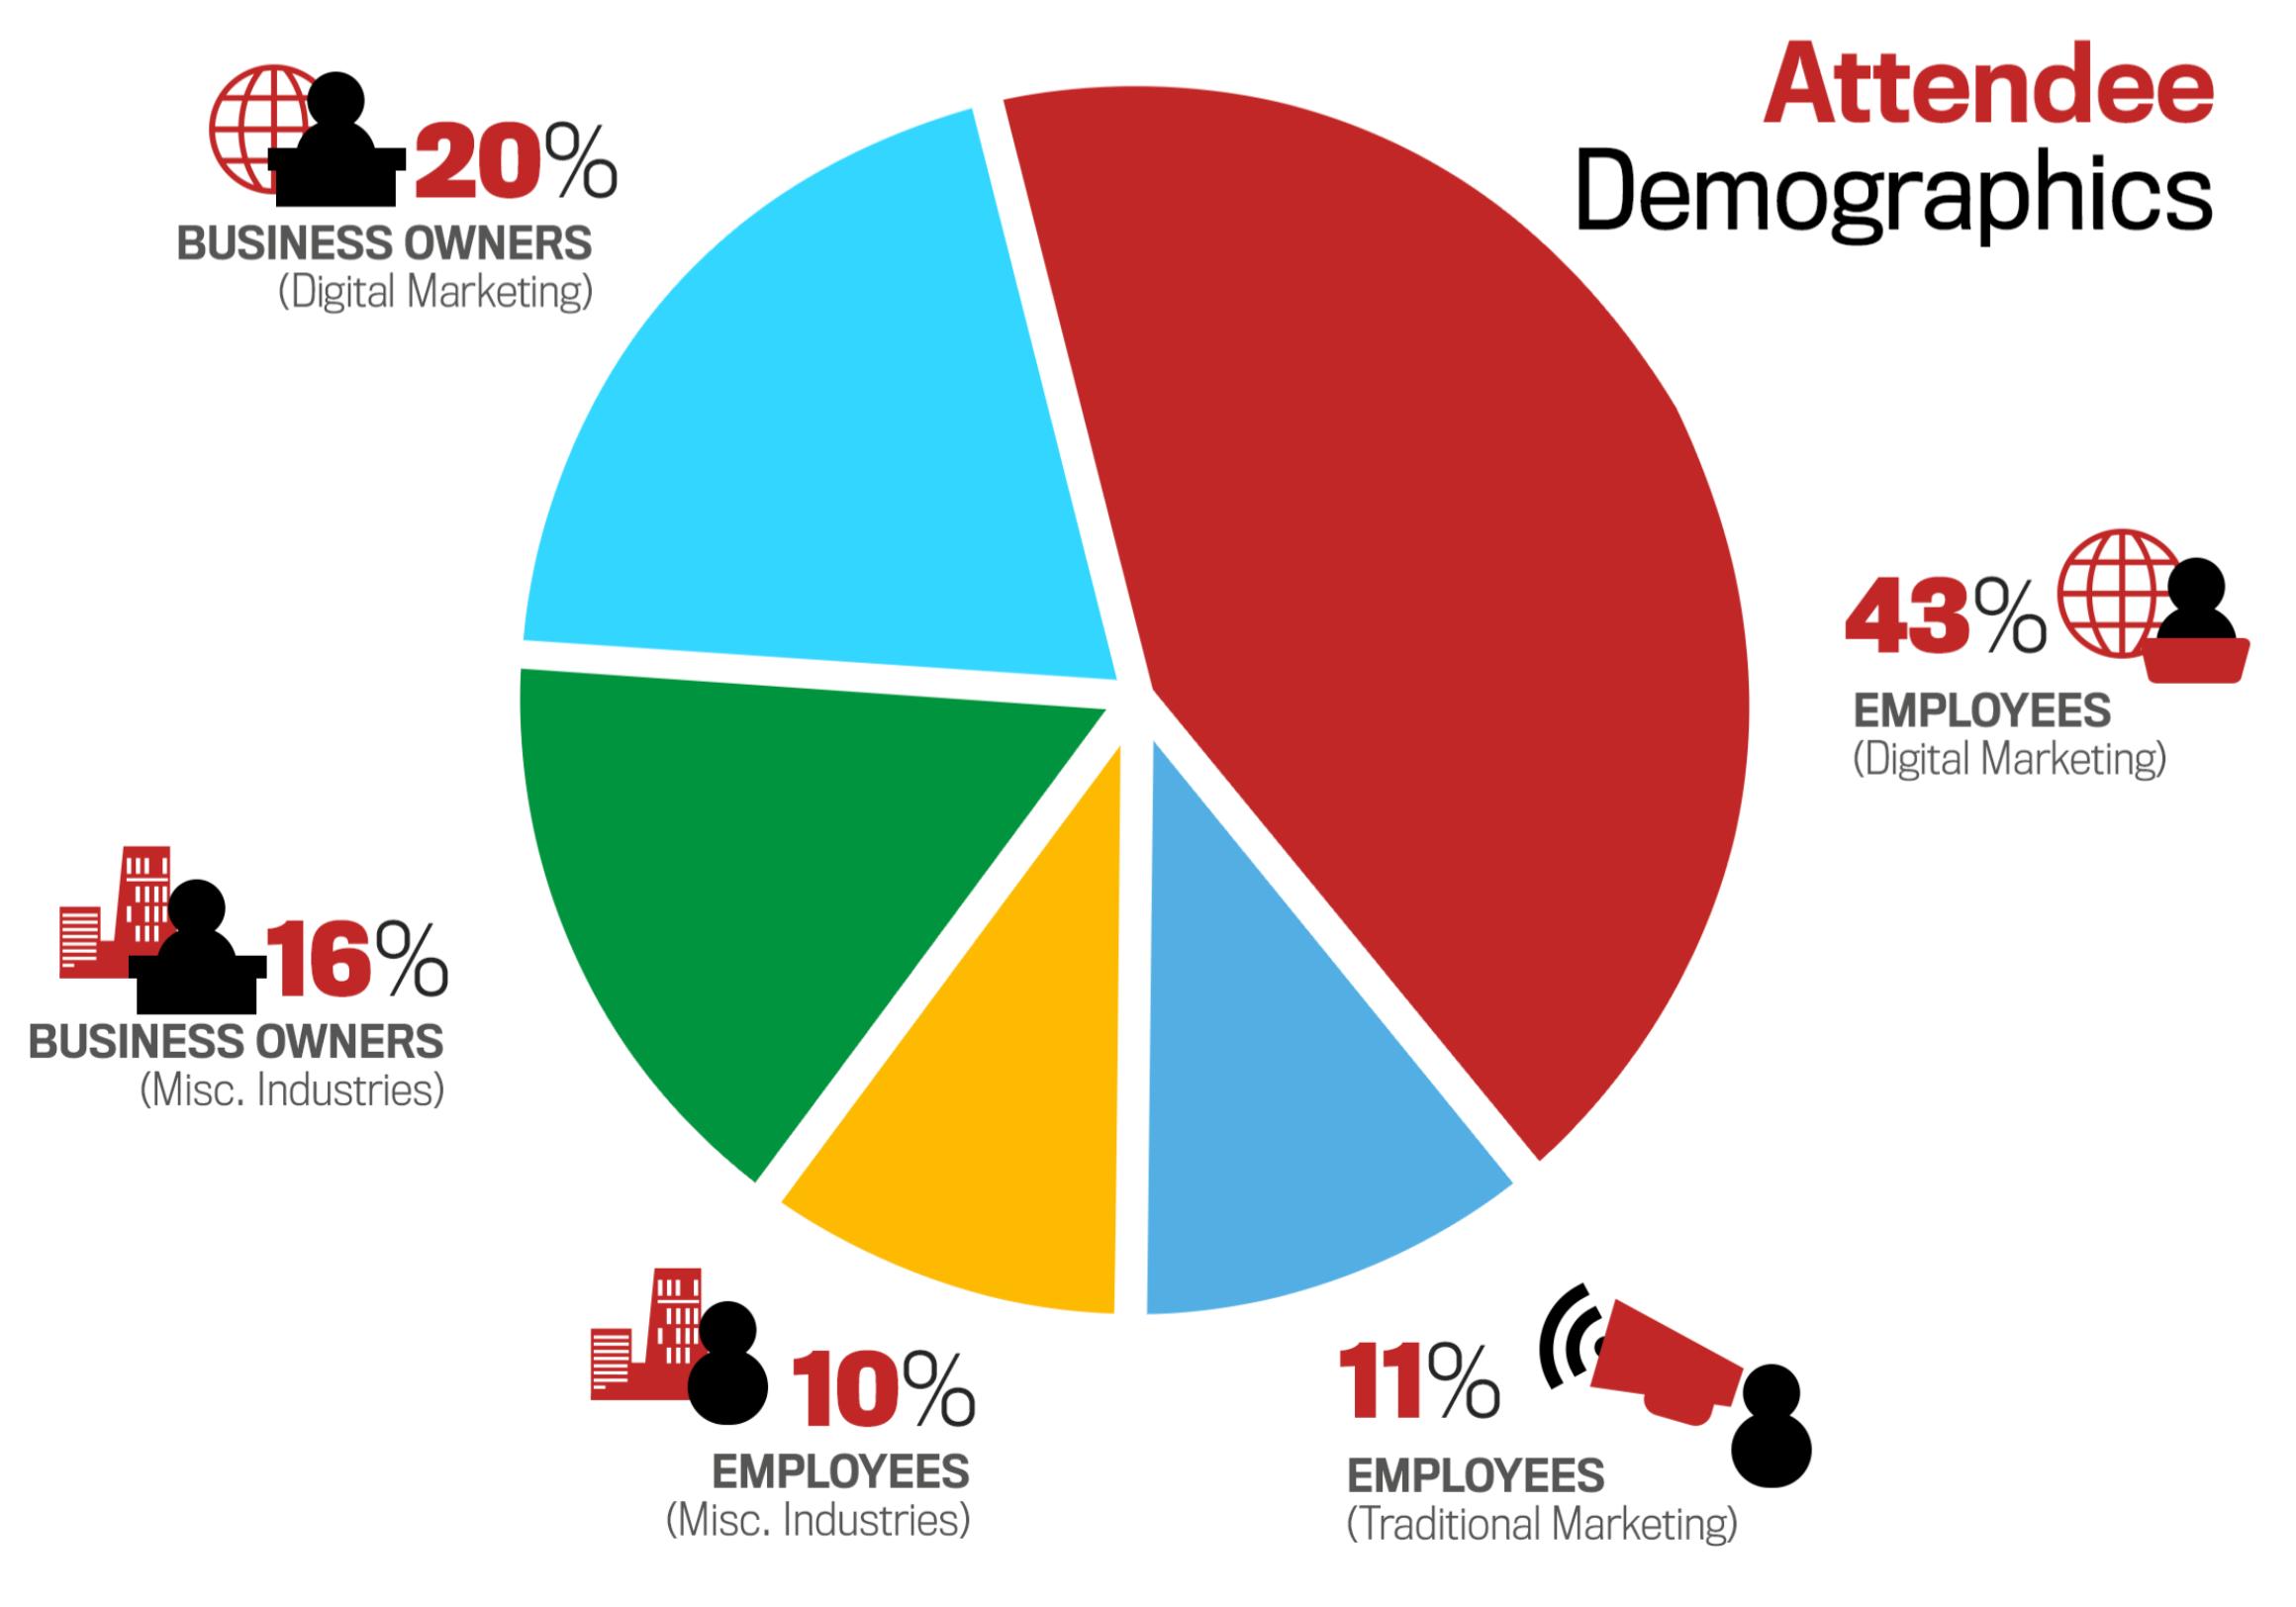 rocks digital marketing attendee demographics